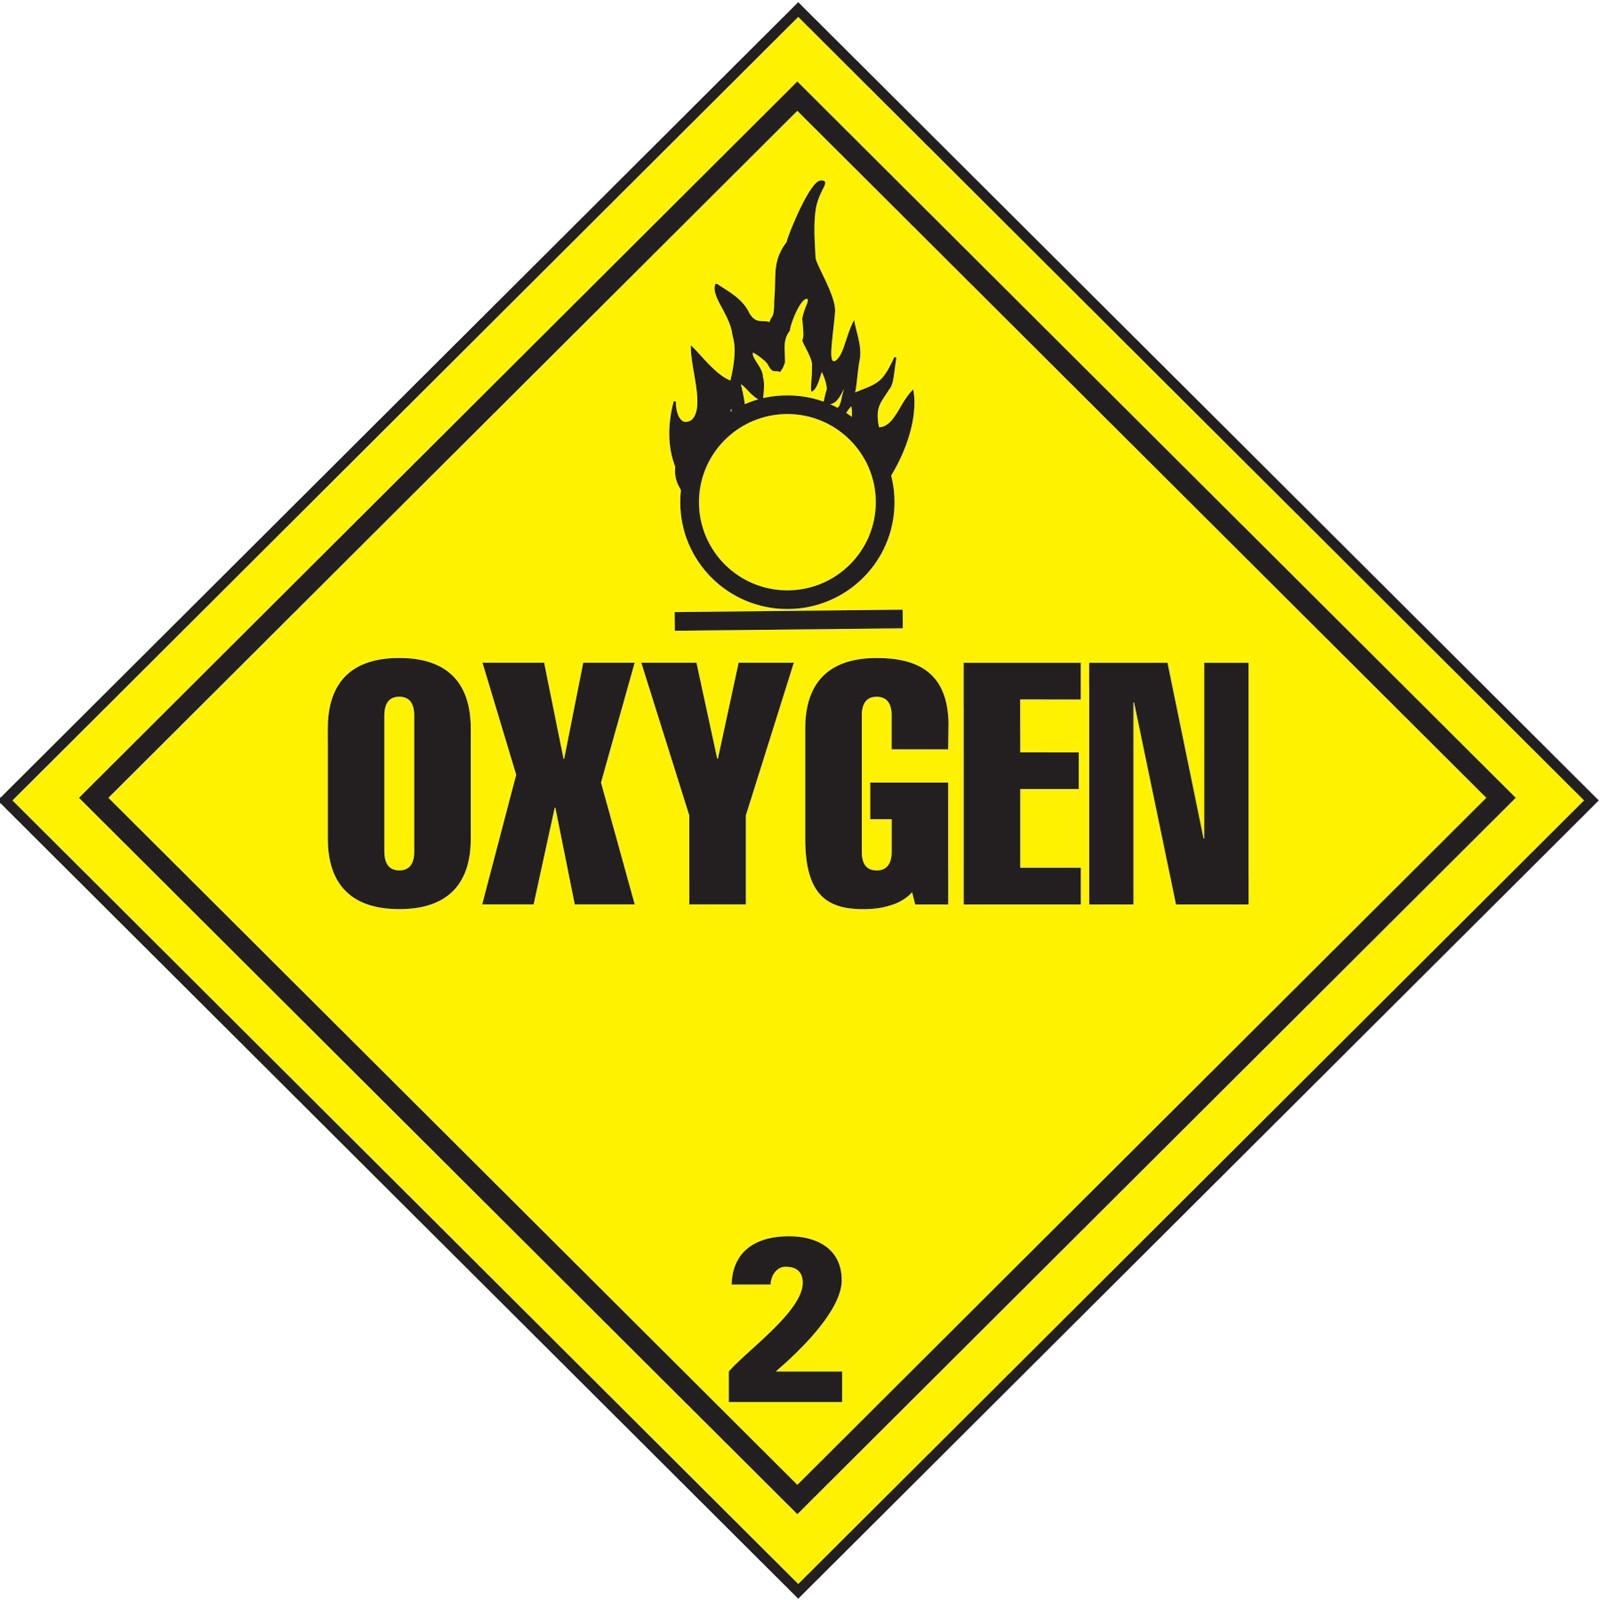 Oxygen 2 DOT Hazardous Materials Vehicle Placard